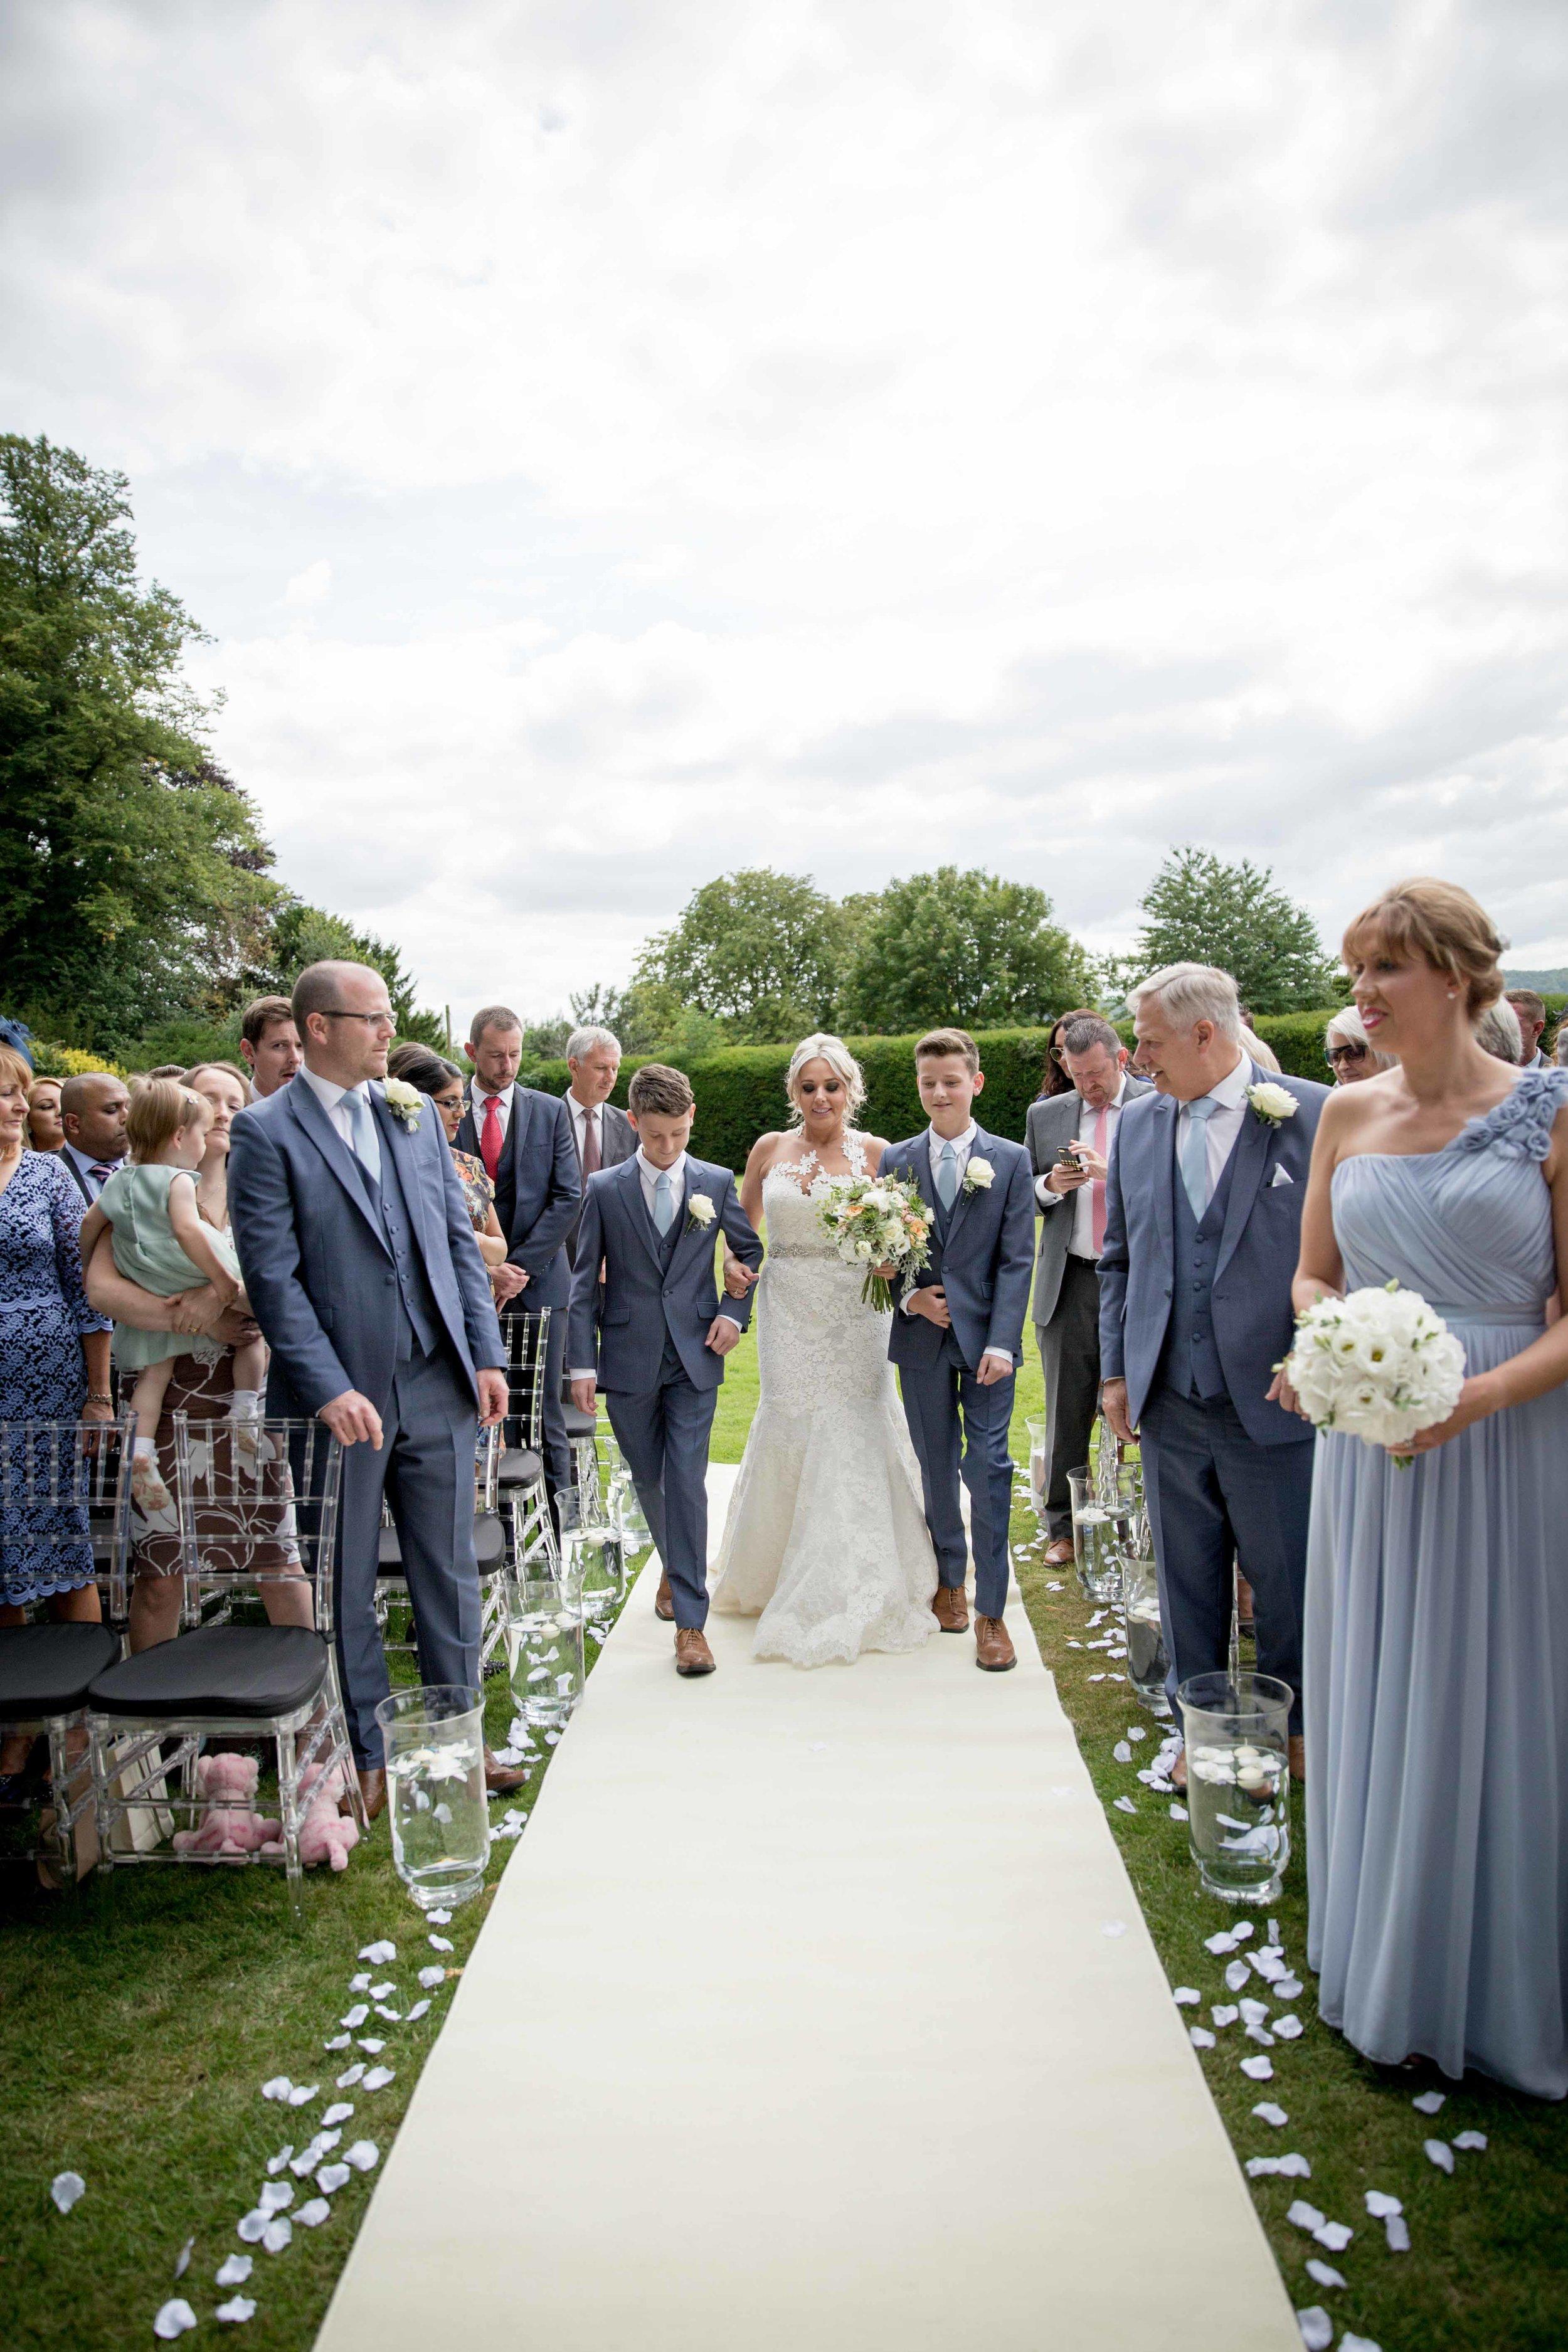 cotswold-wedding-photography-at-stonehouse-court-hotel-natalia-smith-photography-gloucestershire-wedding-photographer-14.jpg